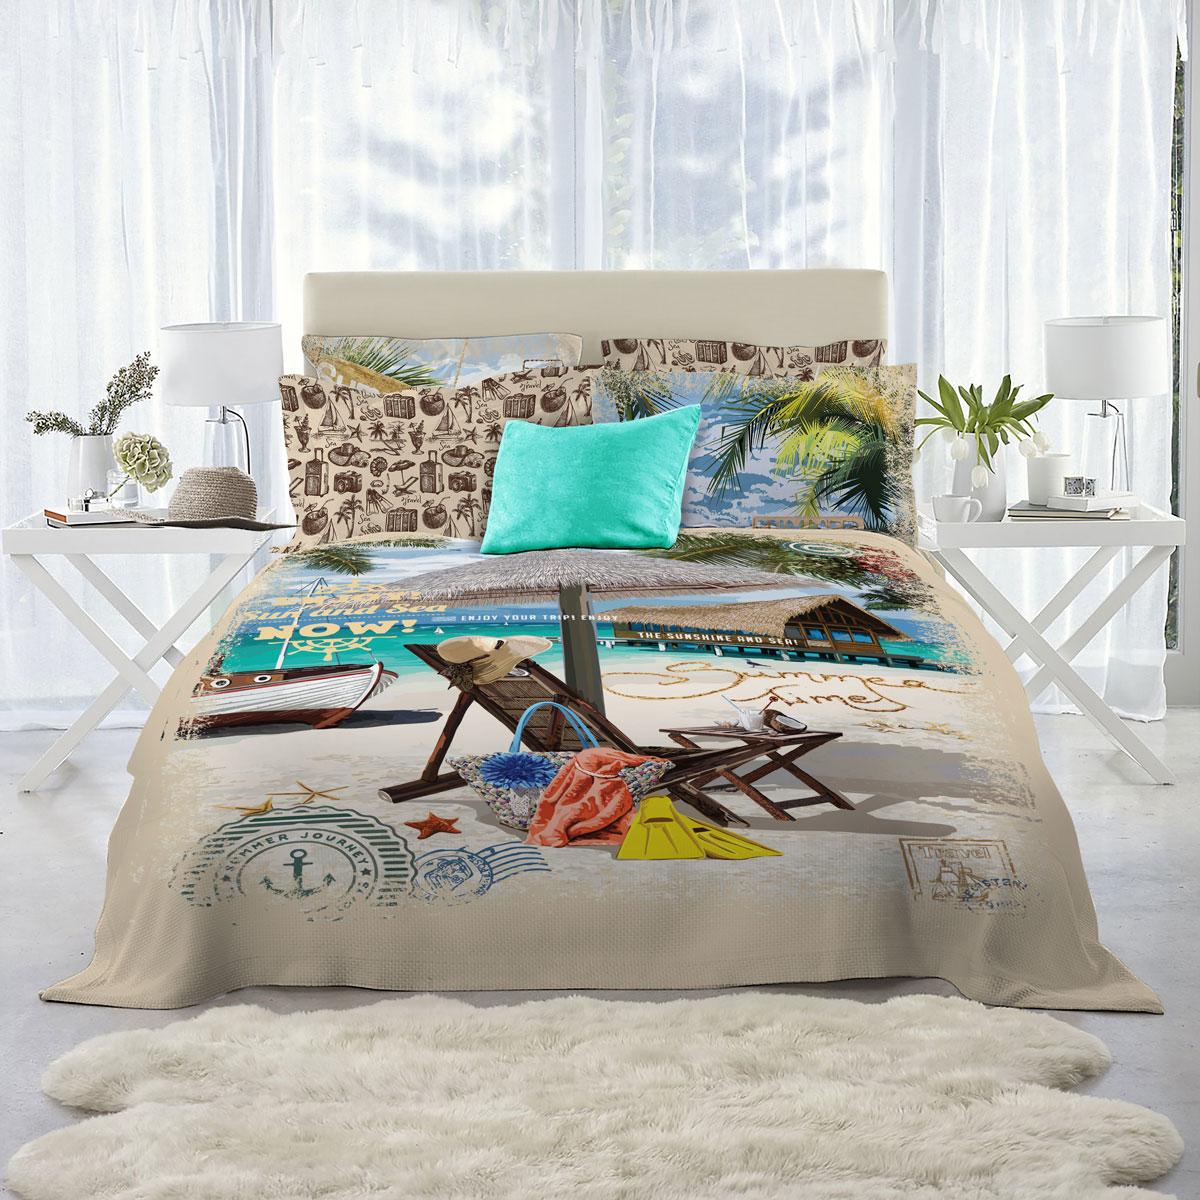 Комплект белья Mona Liza Lounger, семейный, наволочки 50х70, 70х70 adjustable rattan sun lounger patio garden beach lounger transport by sea